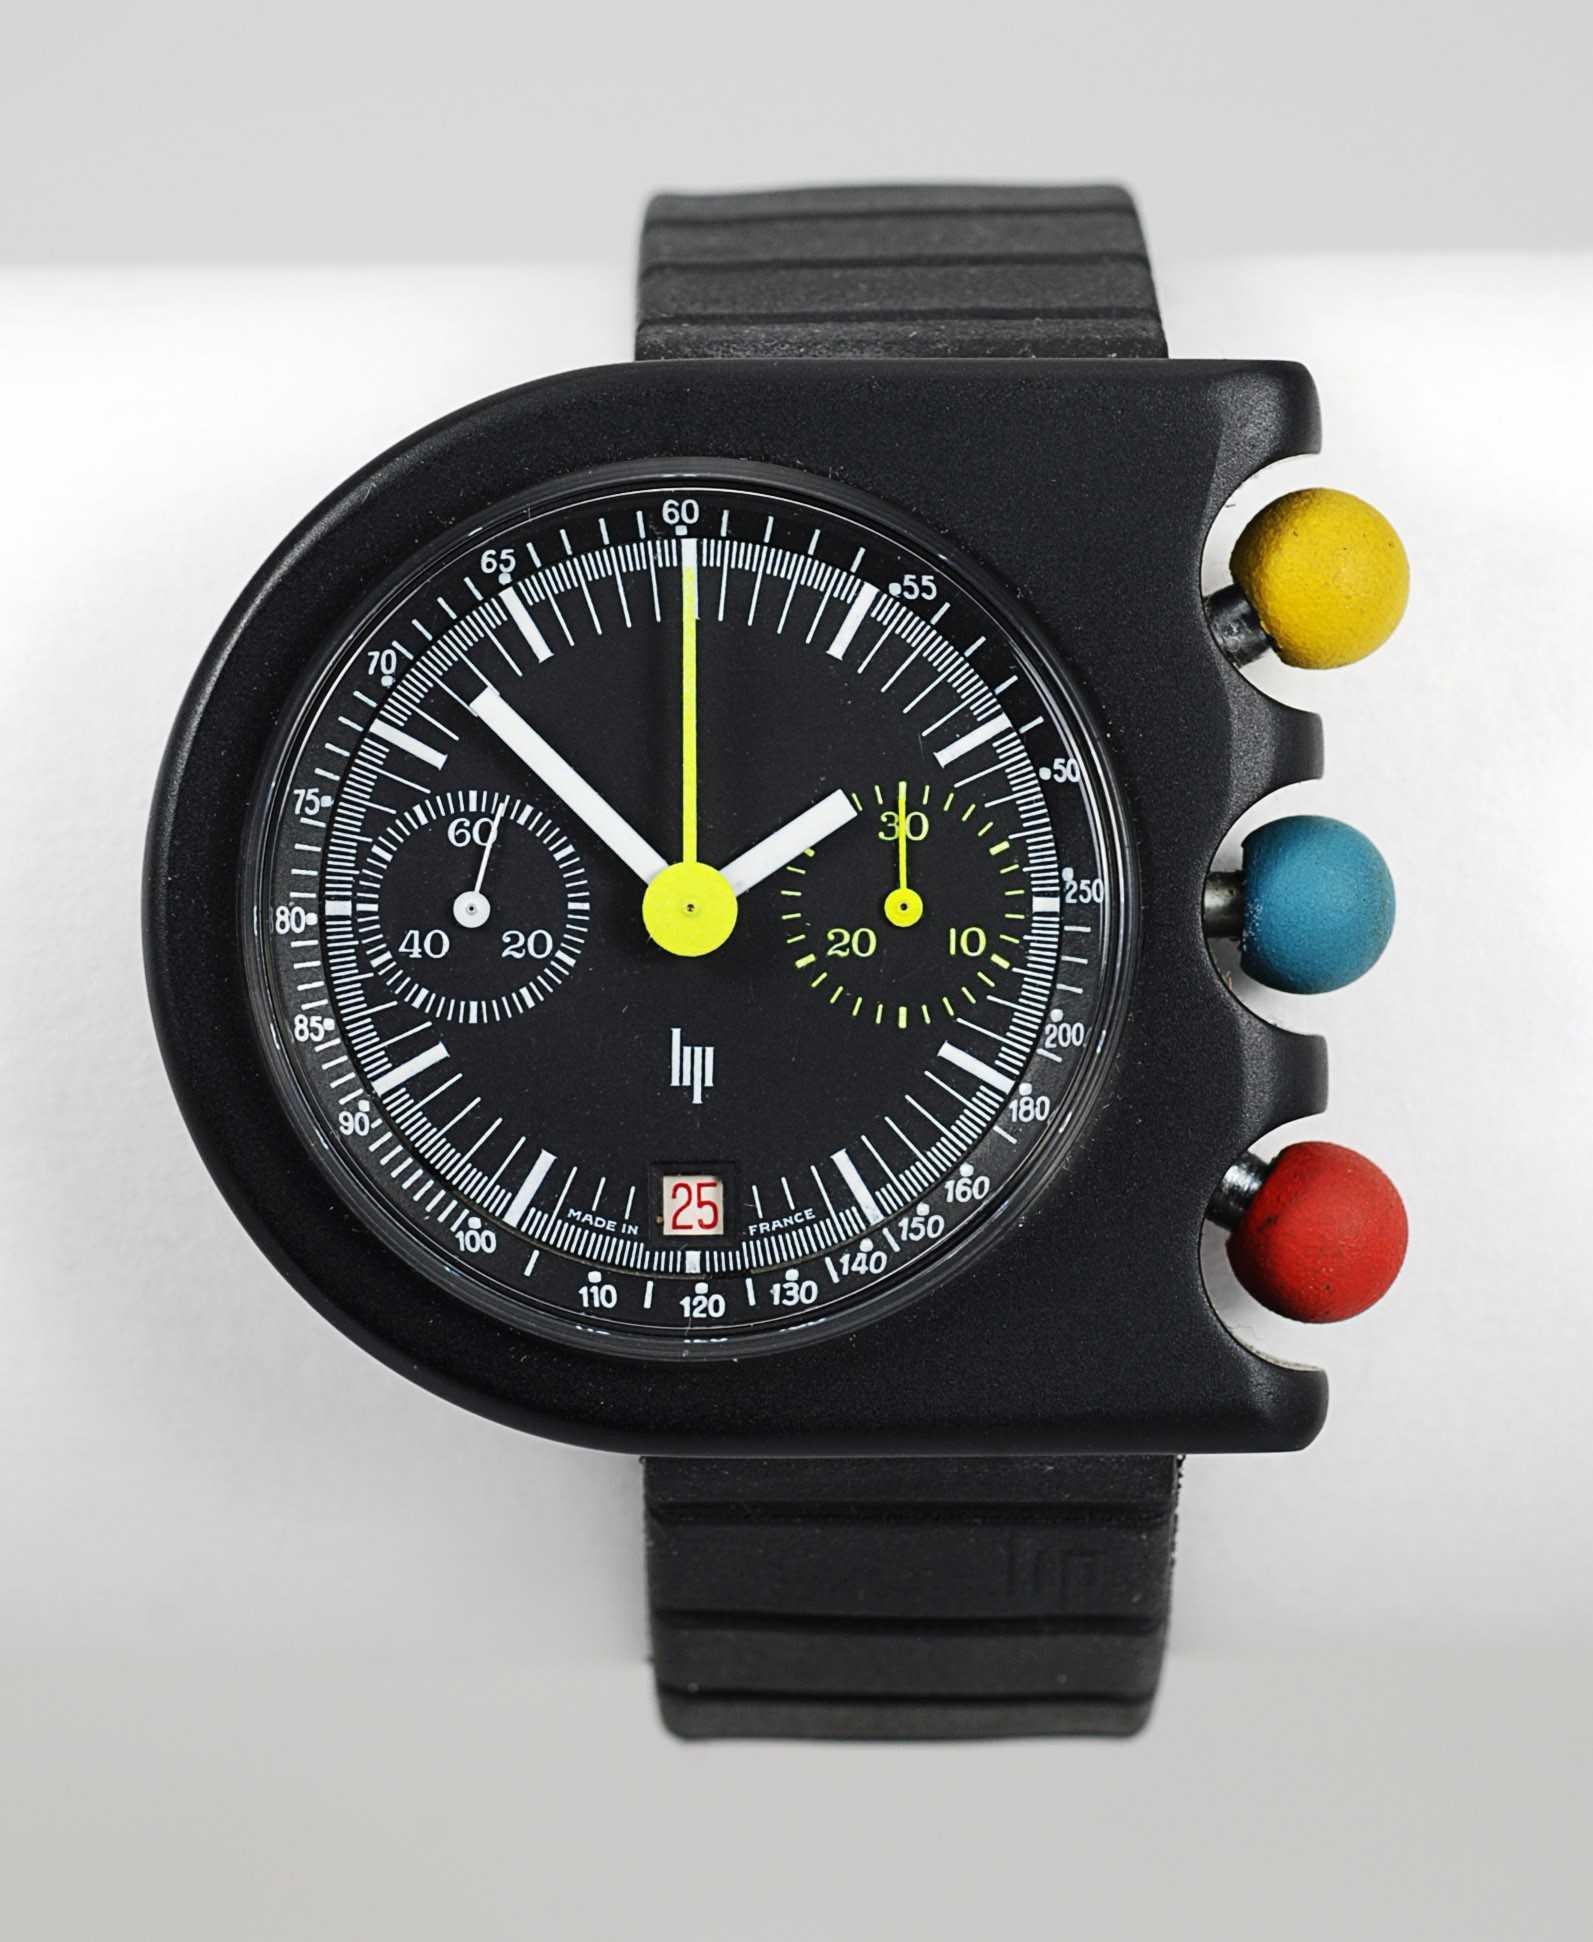 LIP (Chronographe Tallon / Mach 2000 – 3 Couleurs réf. 43756), vers 1975